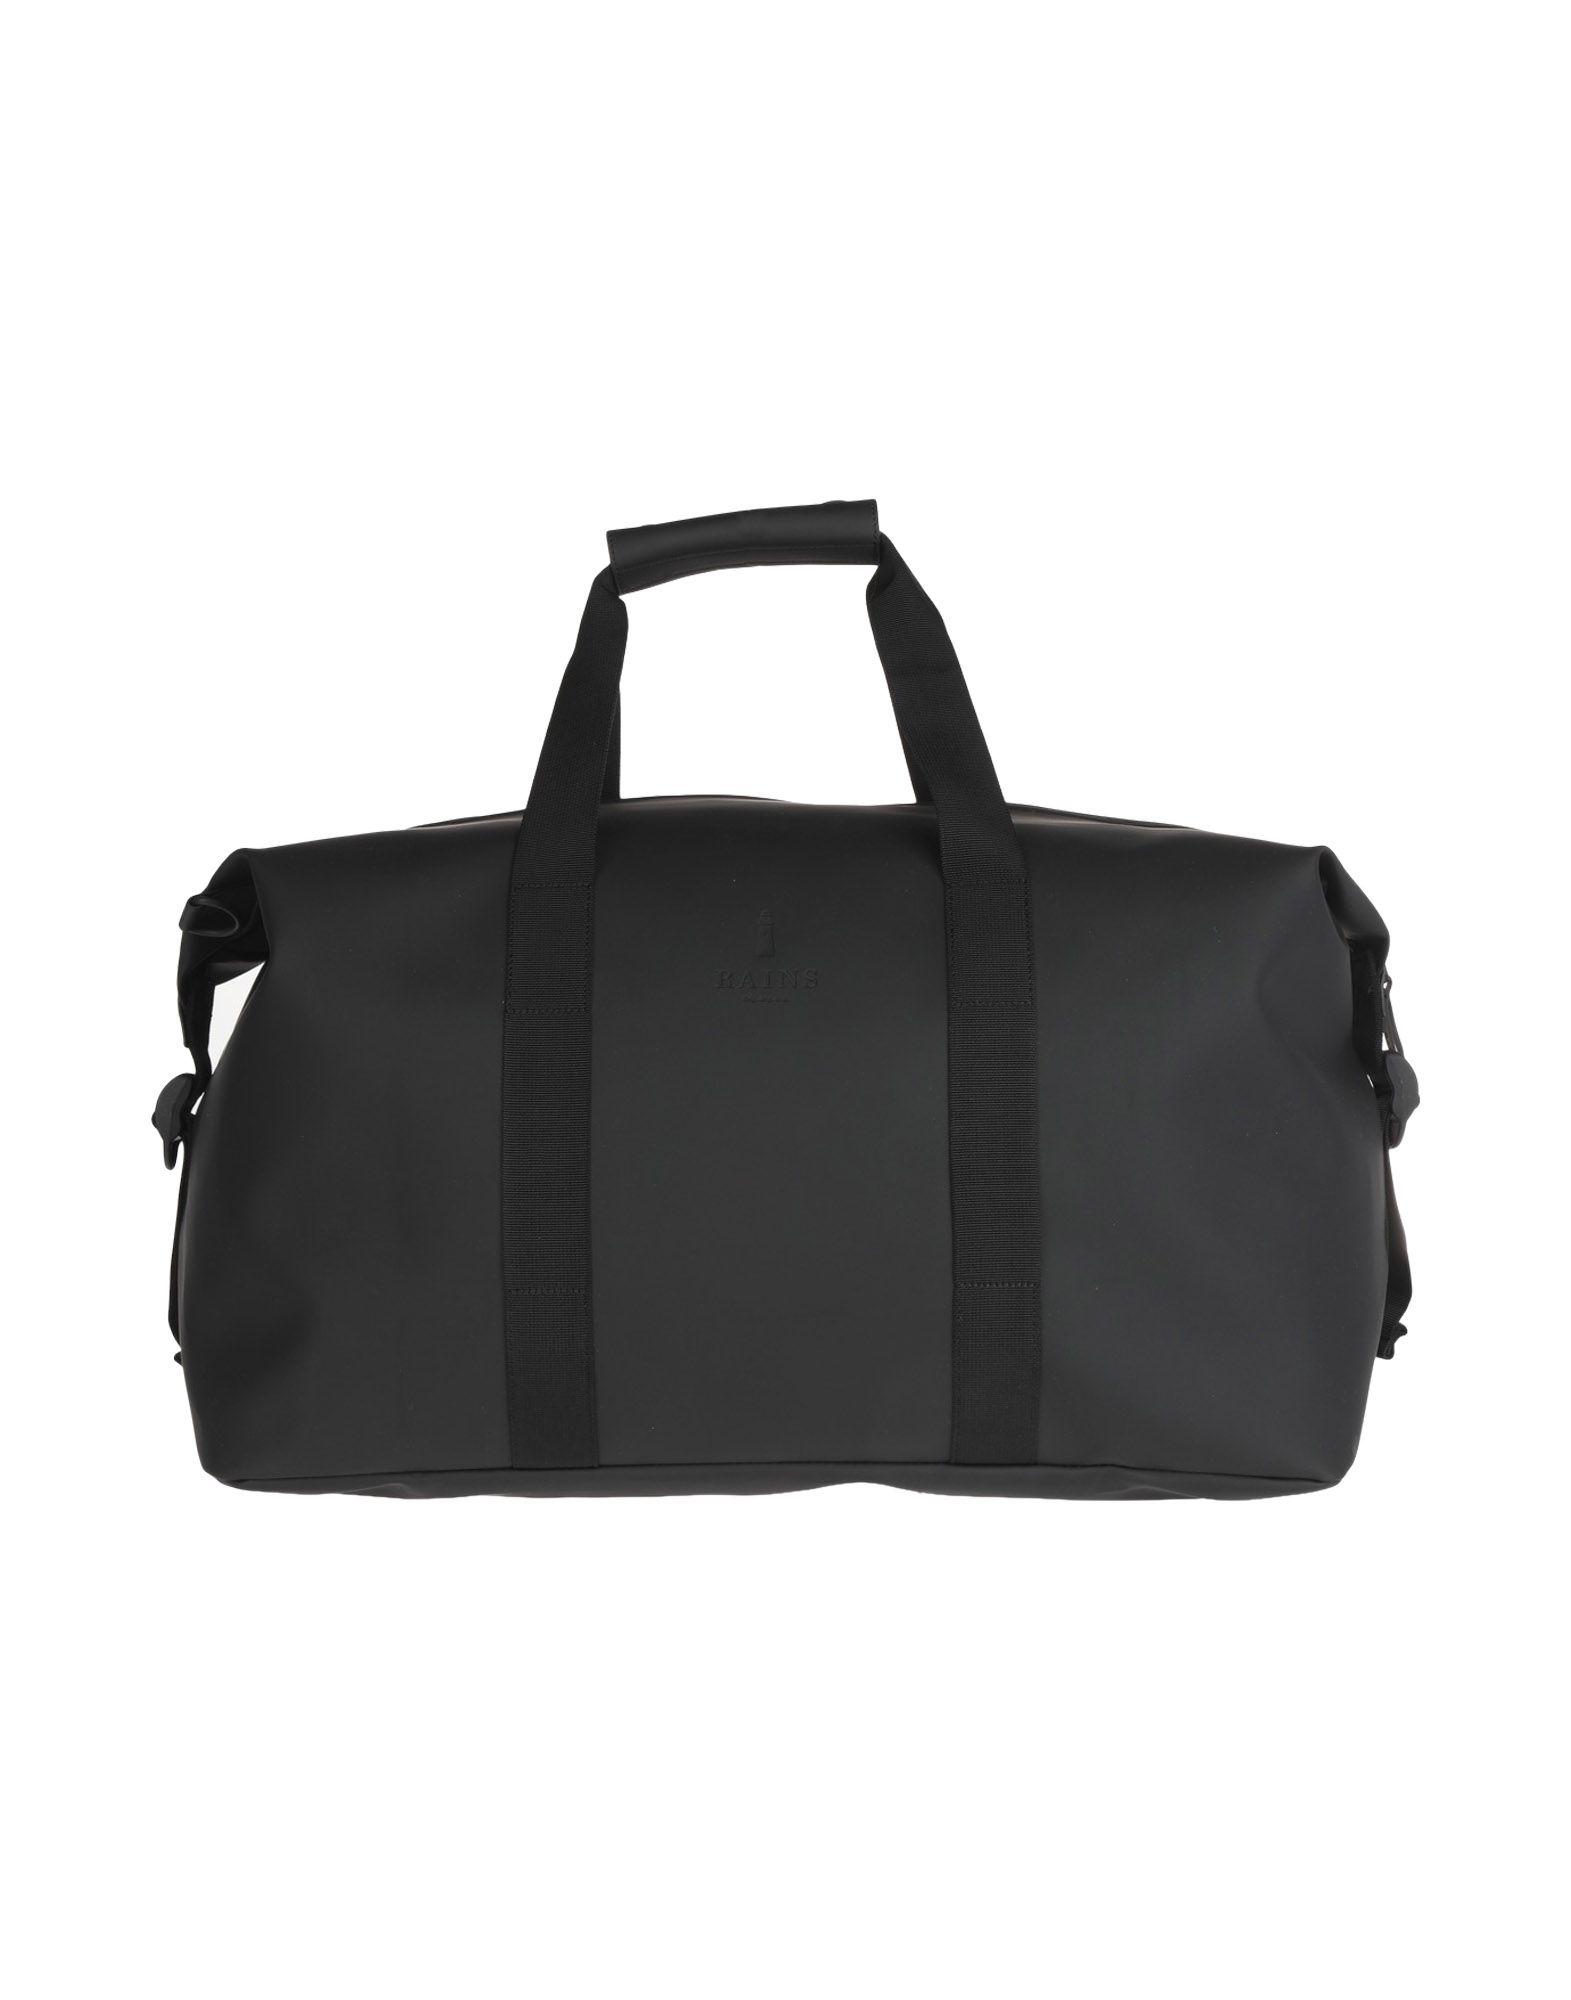 37c12f64f109 RAINS Дорожная сумка